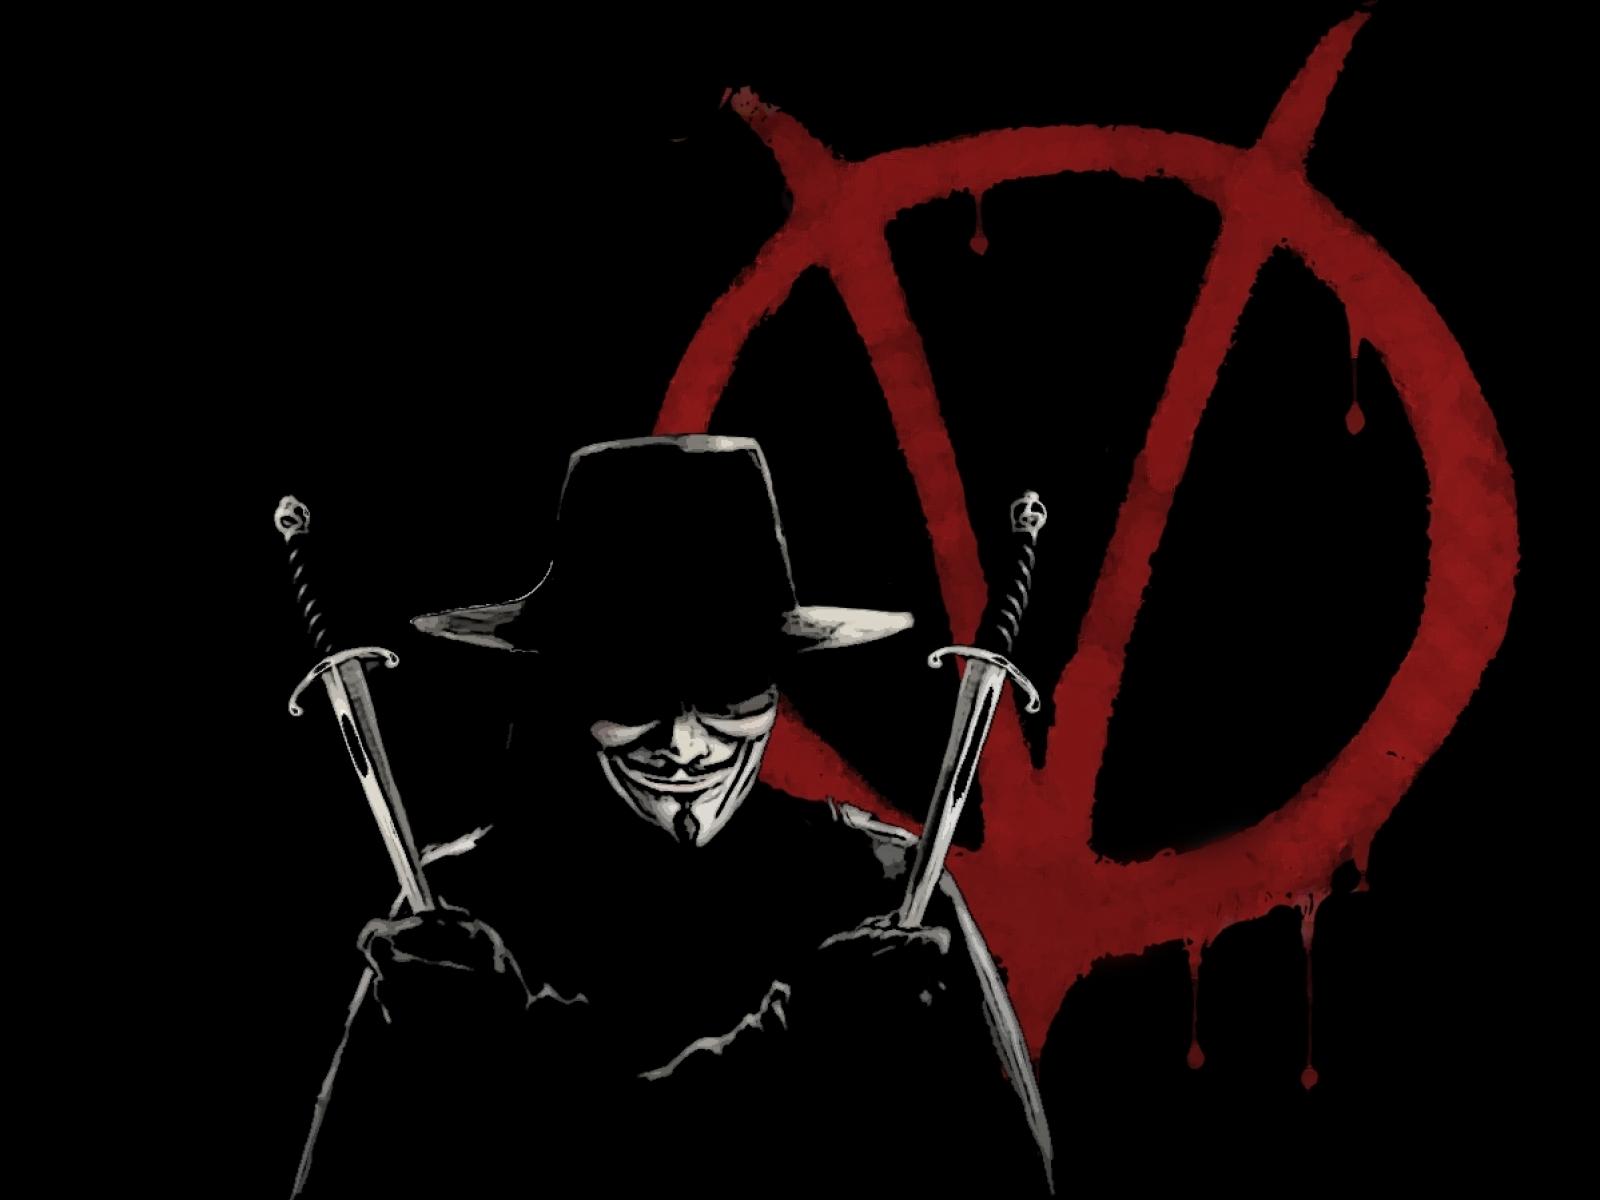 HD V For Vendetta Wallpaper-High Definition Wallpapers Stock